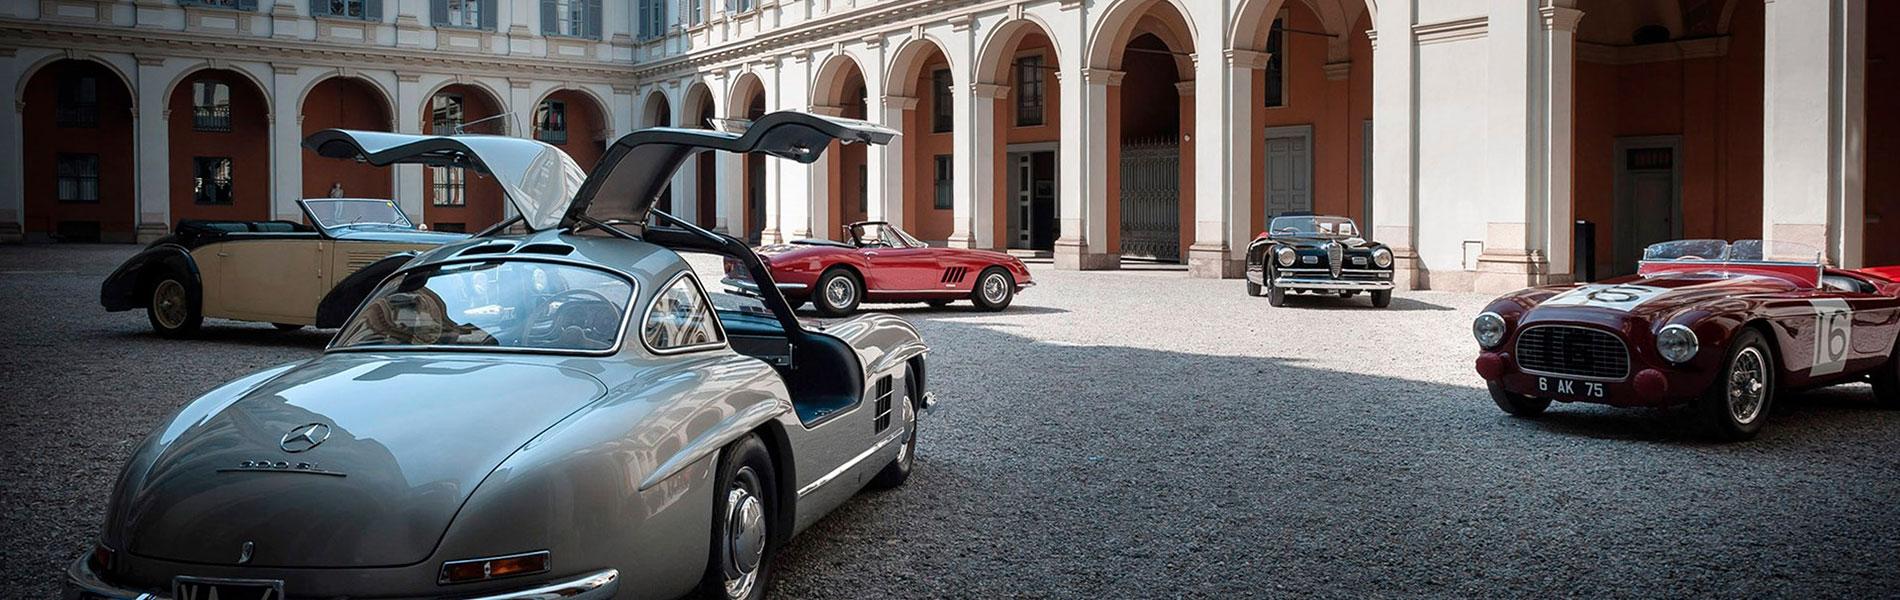 RM Sothebys Milano Giugno 2021 - Immagini RMSotheby's